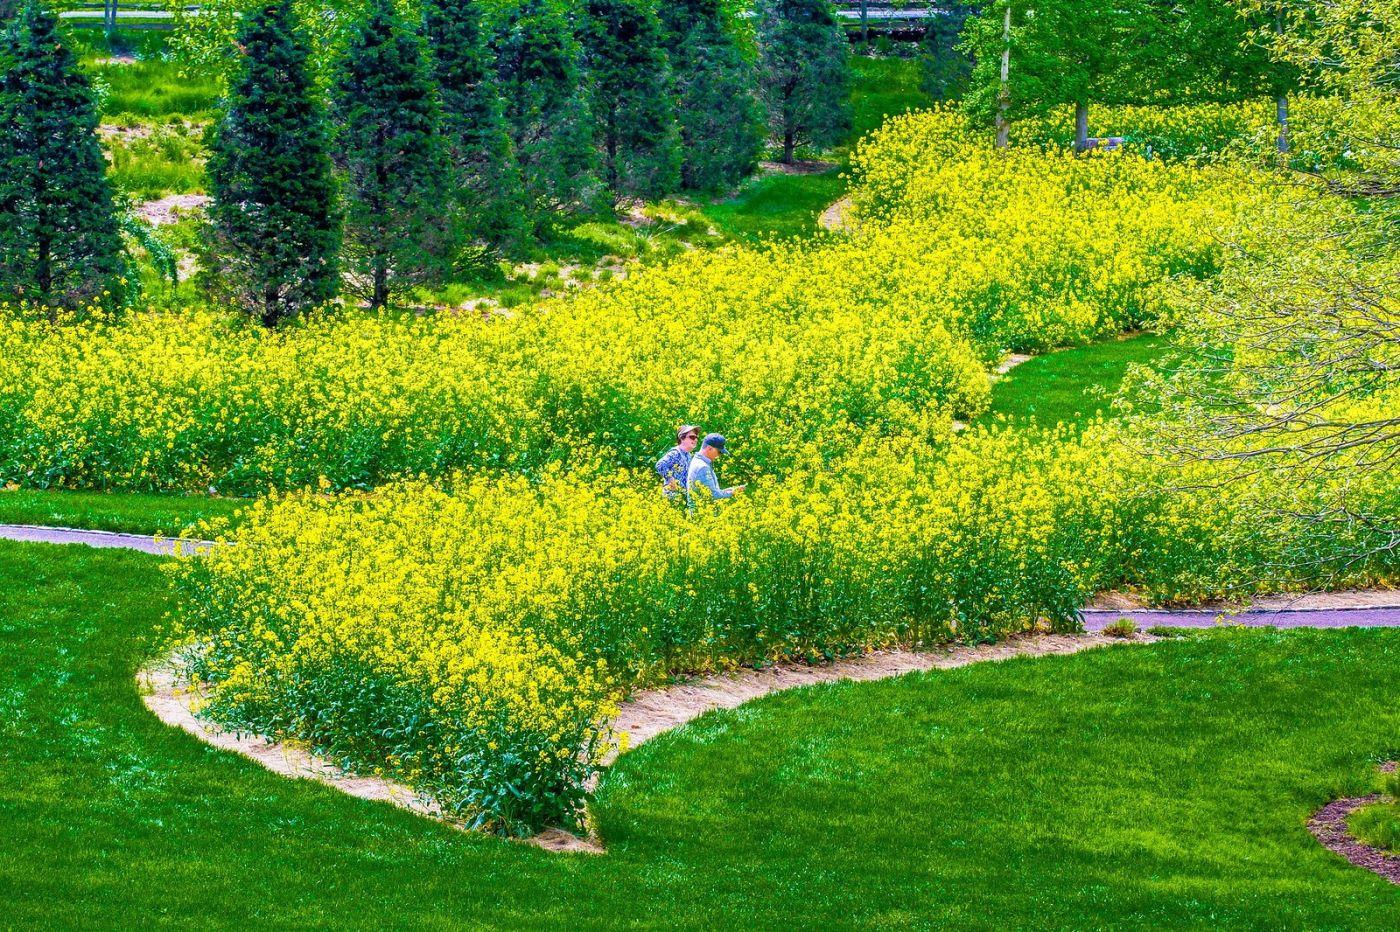 Chanticleer花园,融入自然_图1-1